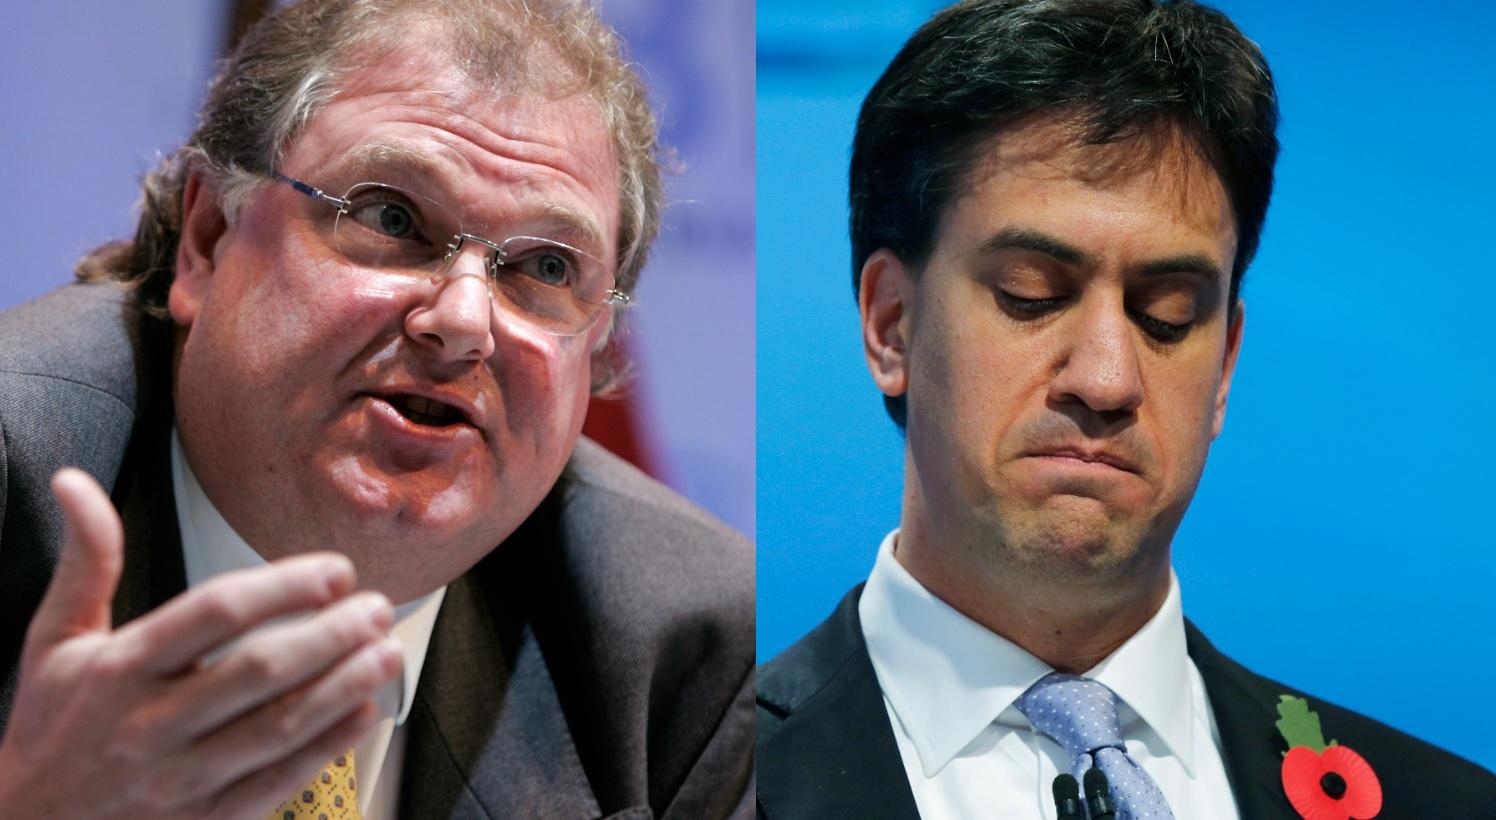 Lord Jones and Ed Miliband